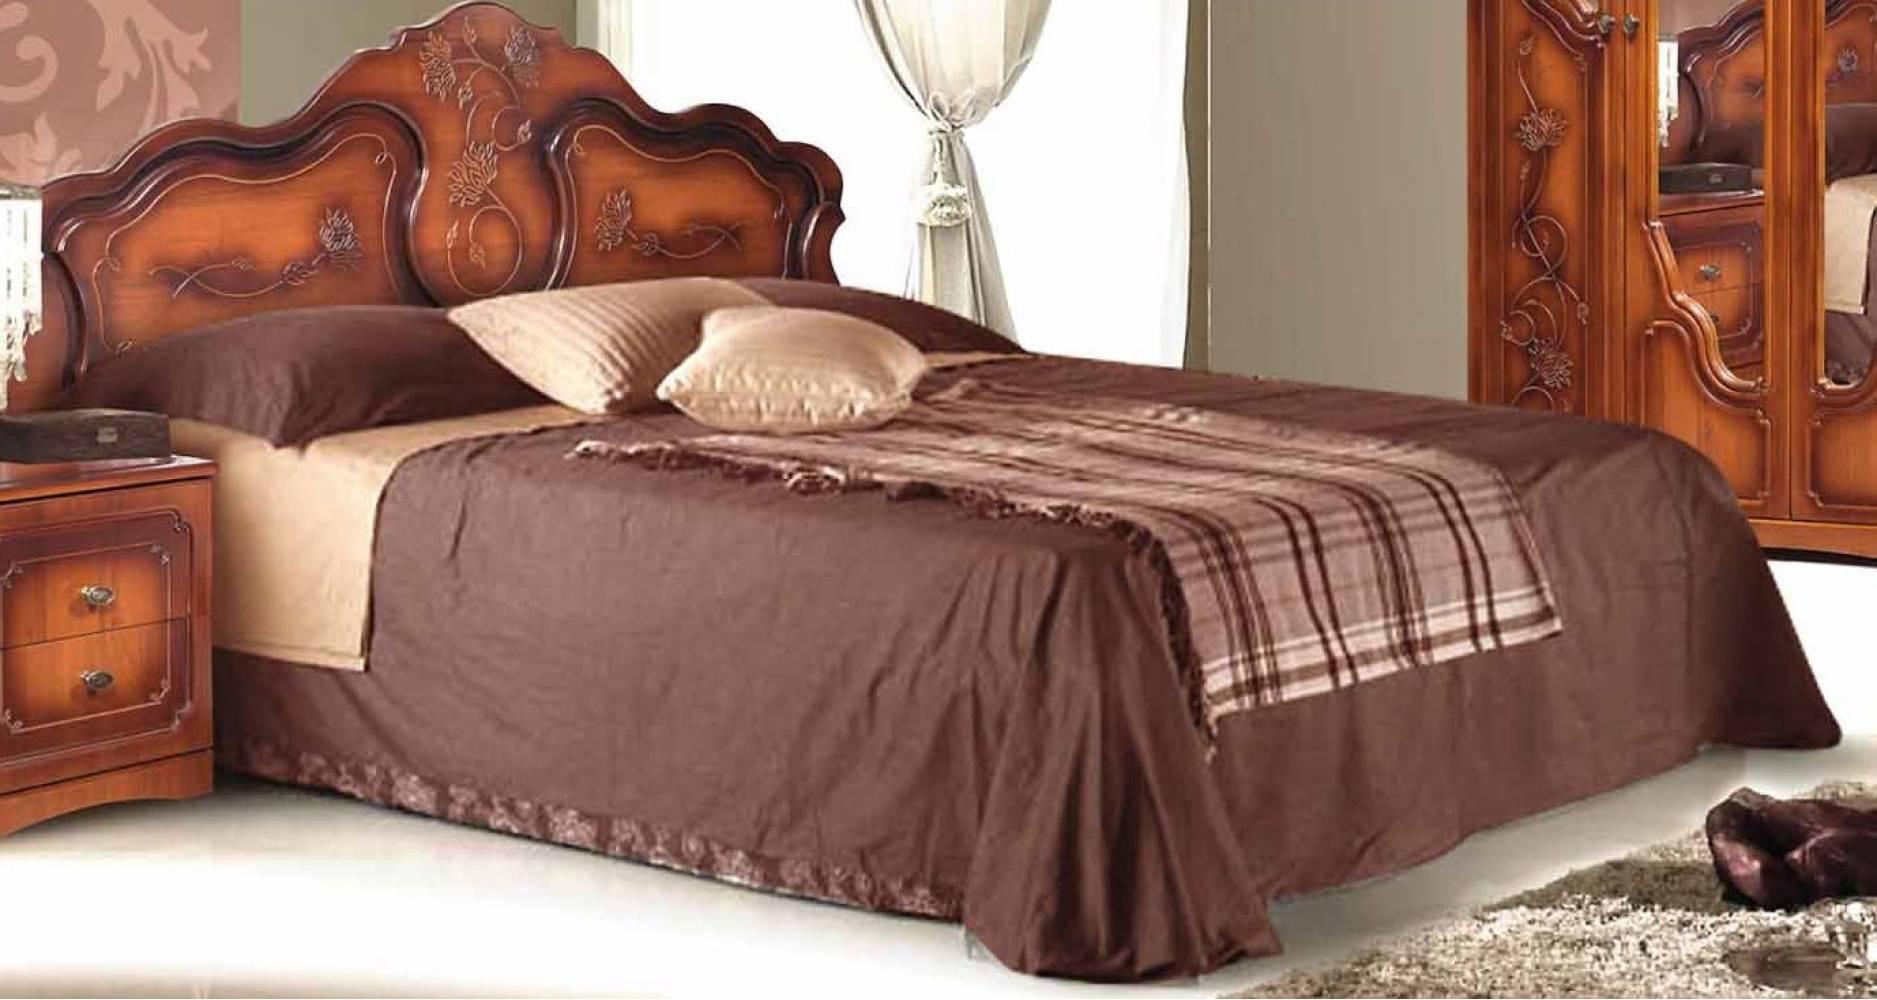 Кровать 1600 Мелани 2 (без мягкого элемента) КМК 0434.6-02